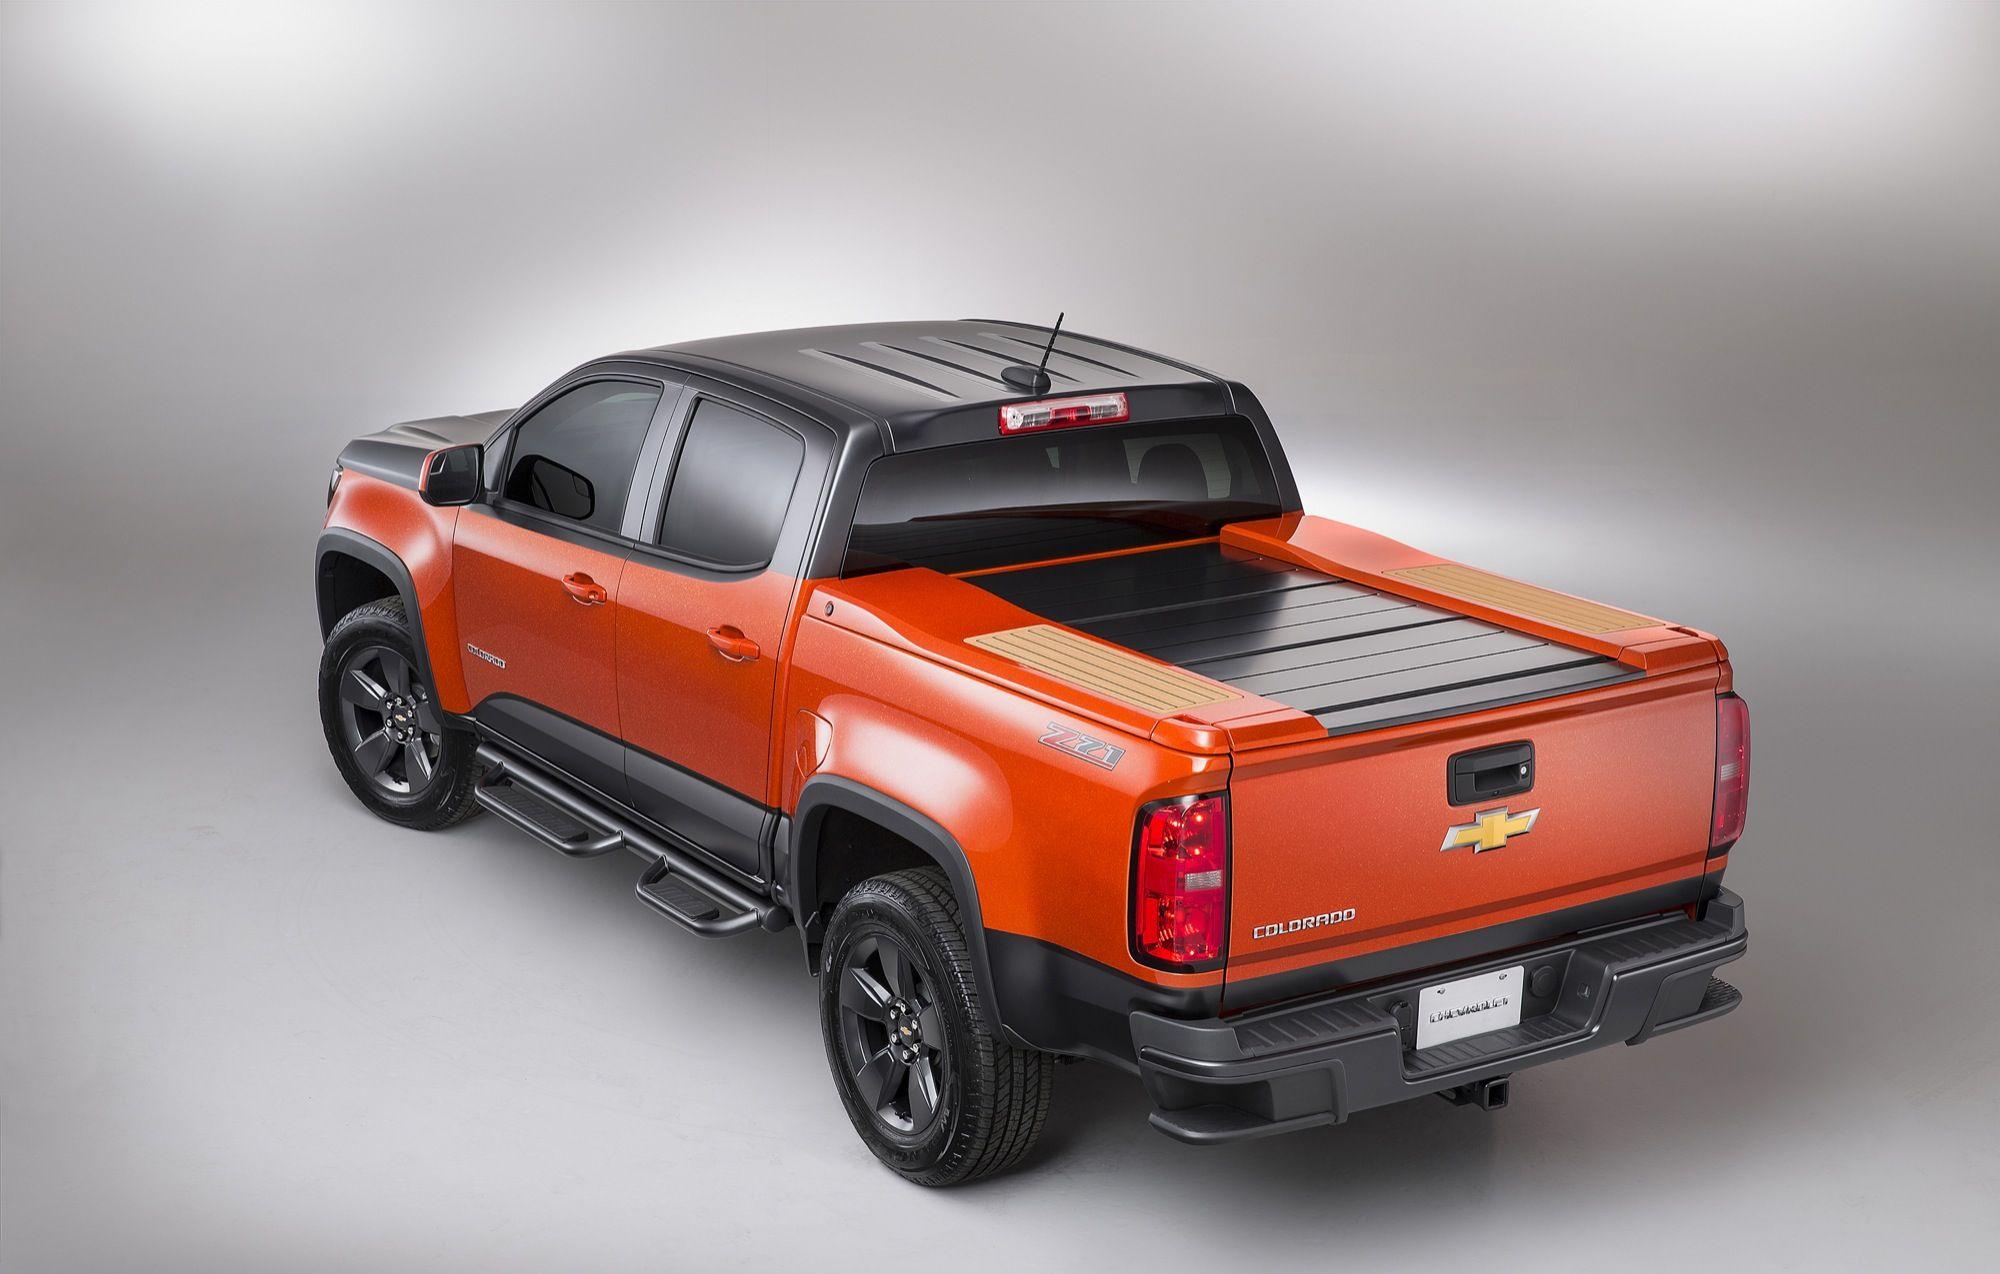 Chevrolet colorado performance concept chevrolet colorado pinterest chevrolet and chevrolet colorado